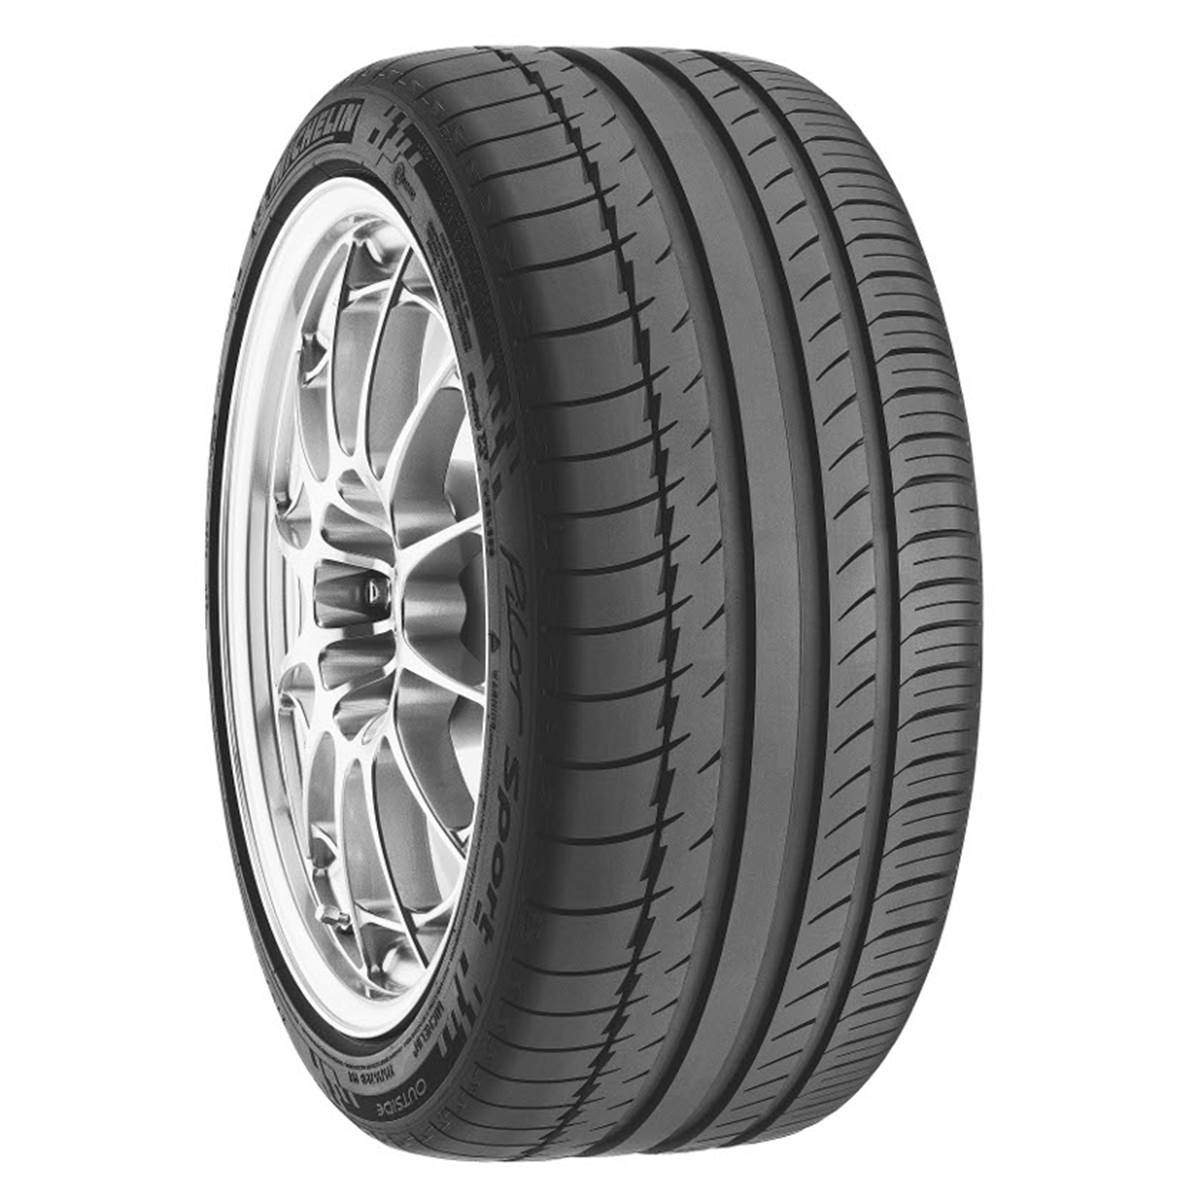 Pneu Michelin 235/40R18 95Y Pilot Sport Ps2 XL